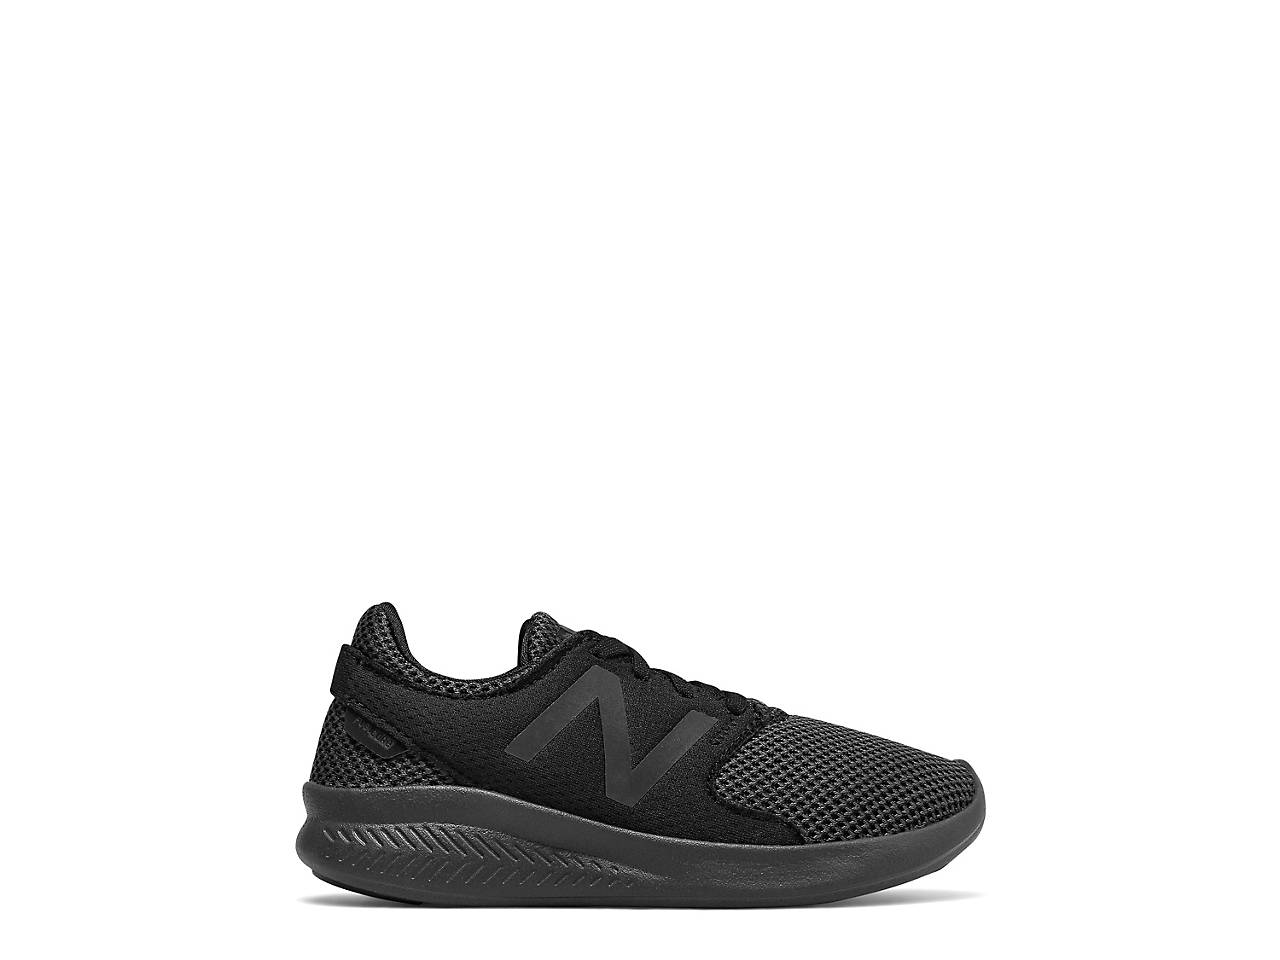 Día Deducir Mordrin  New Balance FuelCore Coast V3 Sneaker - Kids' Kids Shoes | DSW